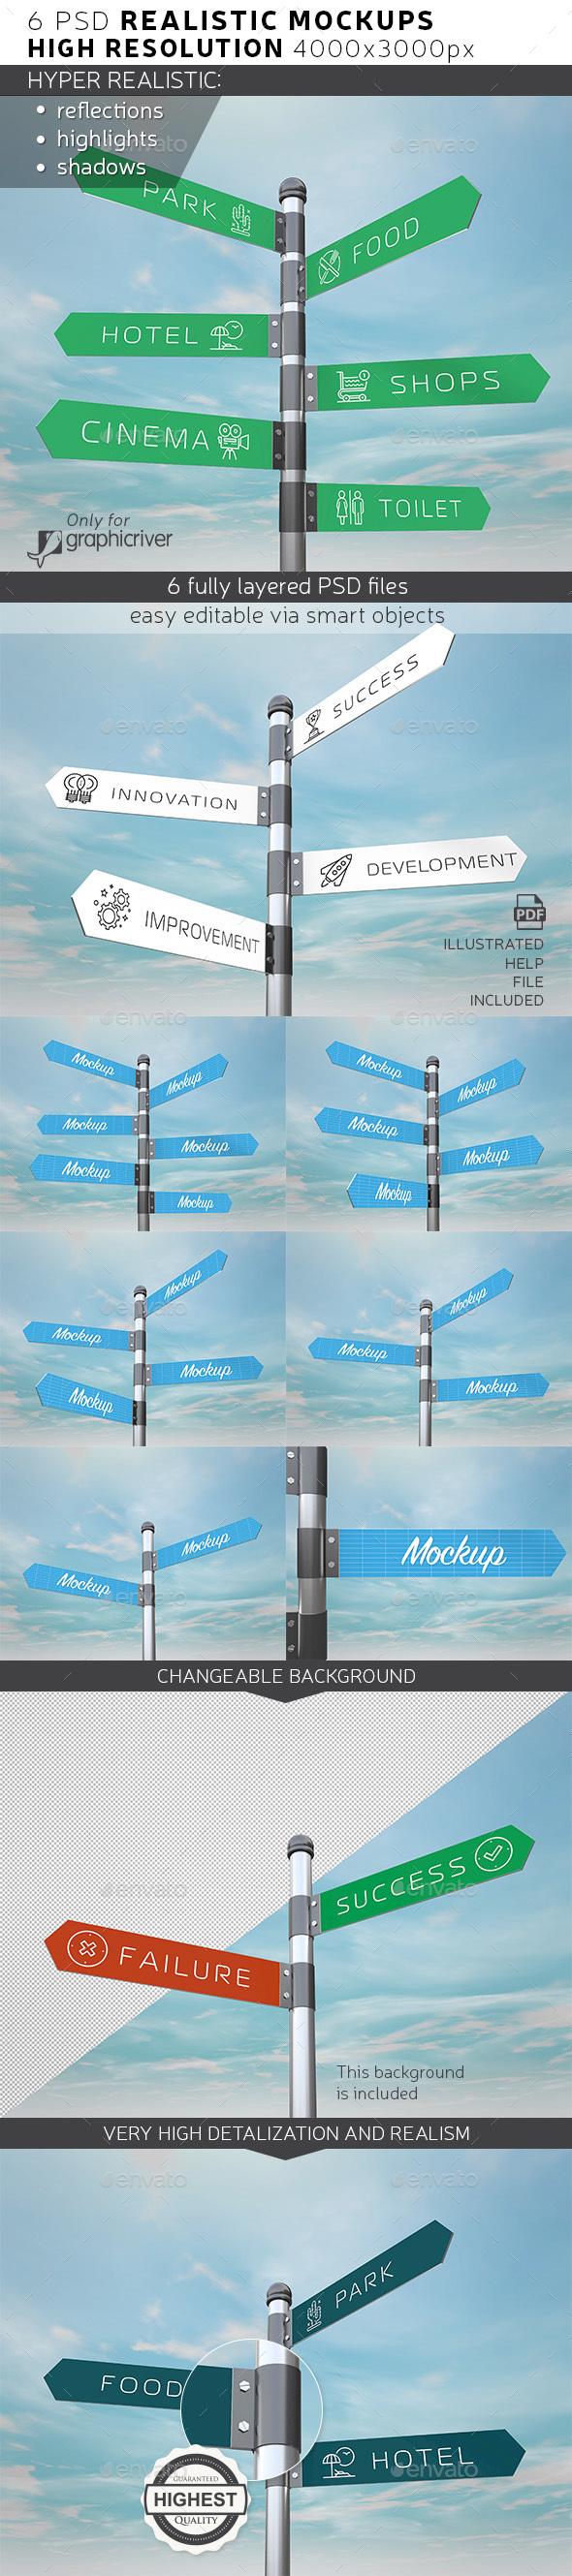 Signpost / Guidepost Mockup - Product Mock-Ups Graphics